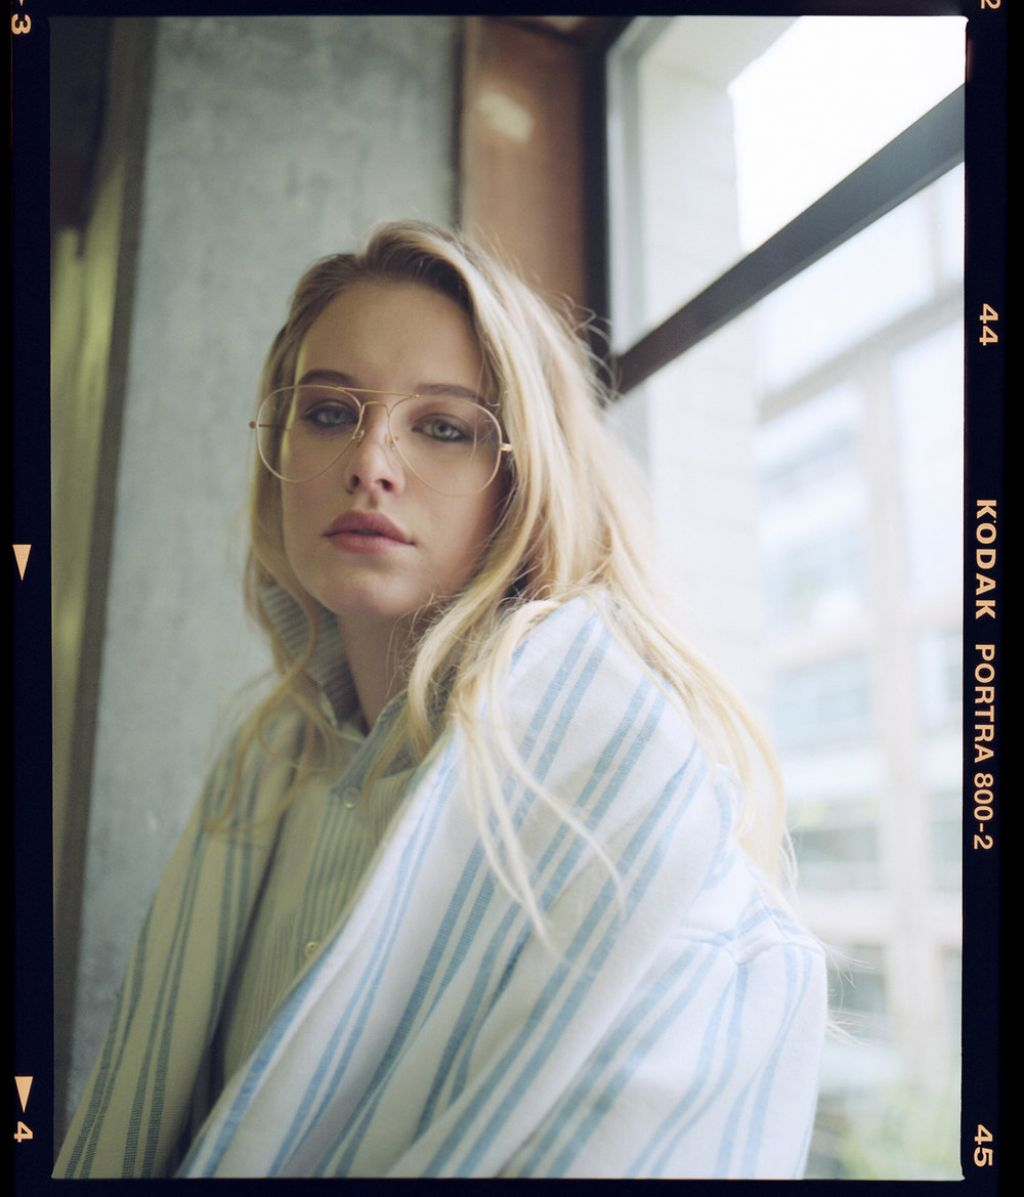 Tiera Skovbye Photographed For Leen Magazine 2017